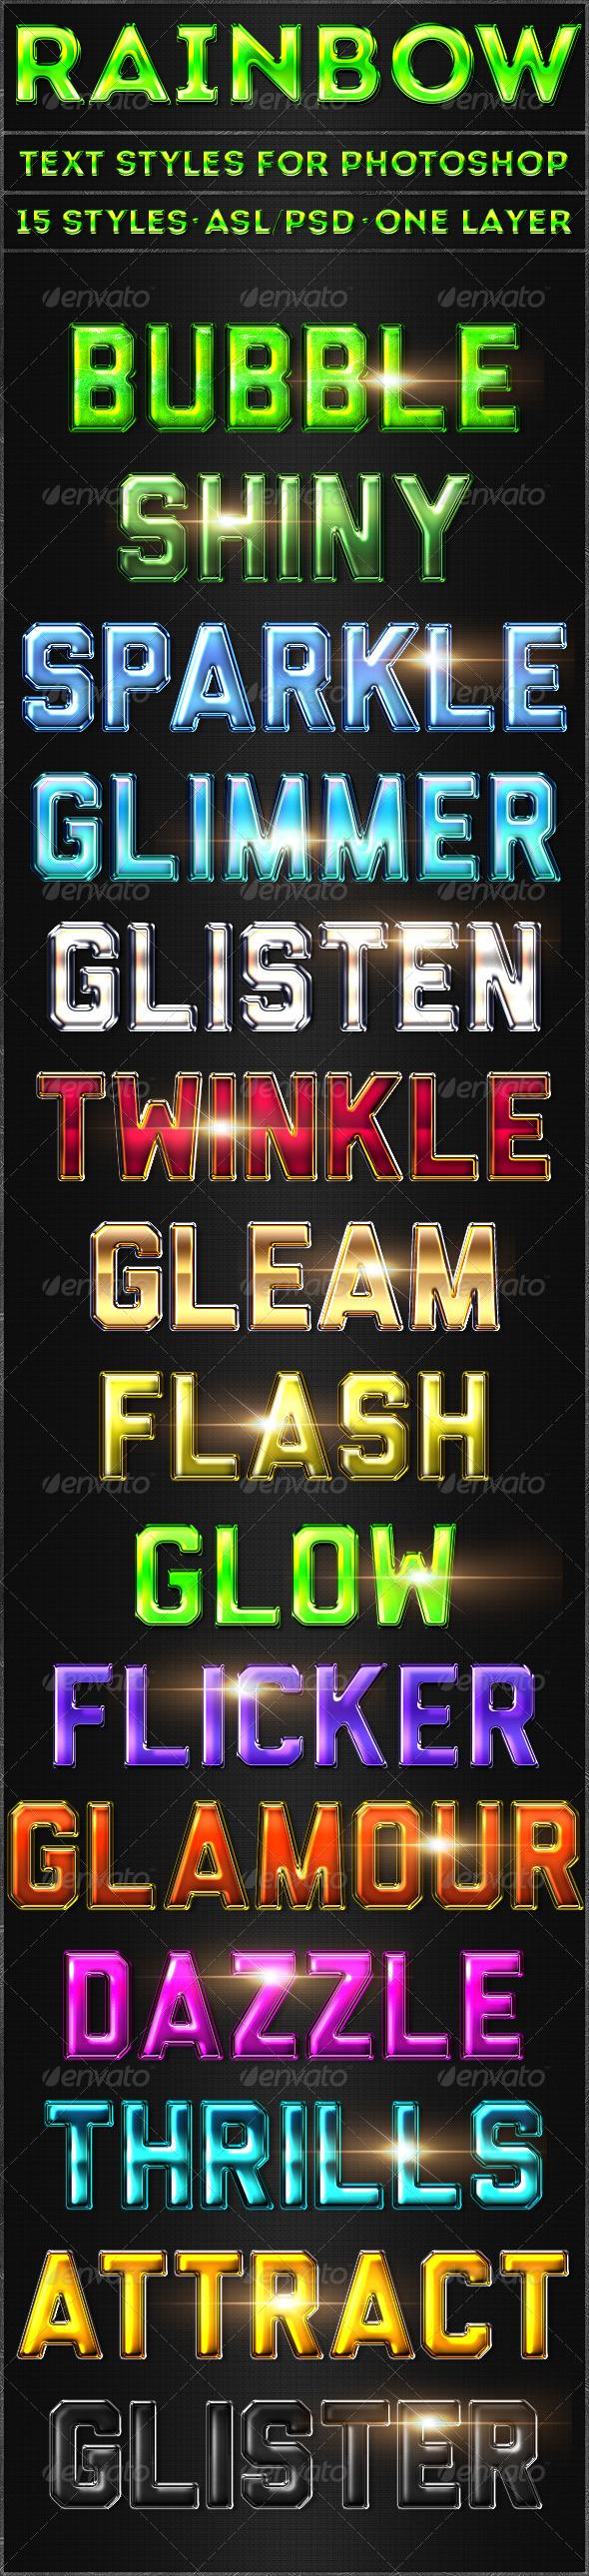 GraphicRiver Rainbow Text Styles 5317805